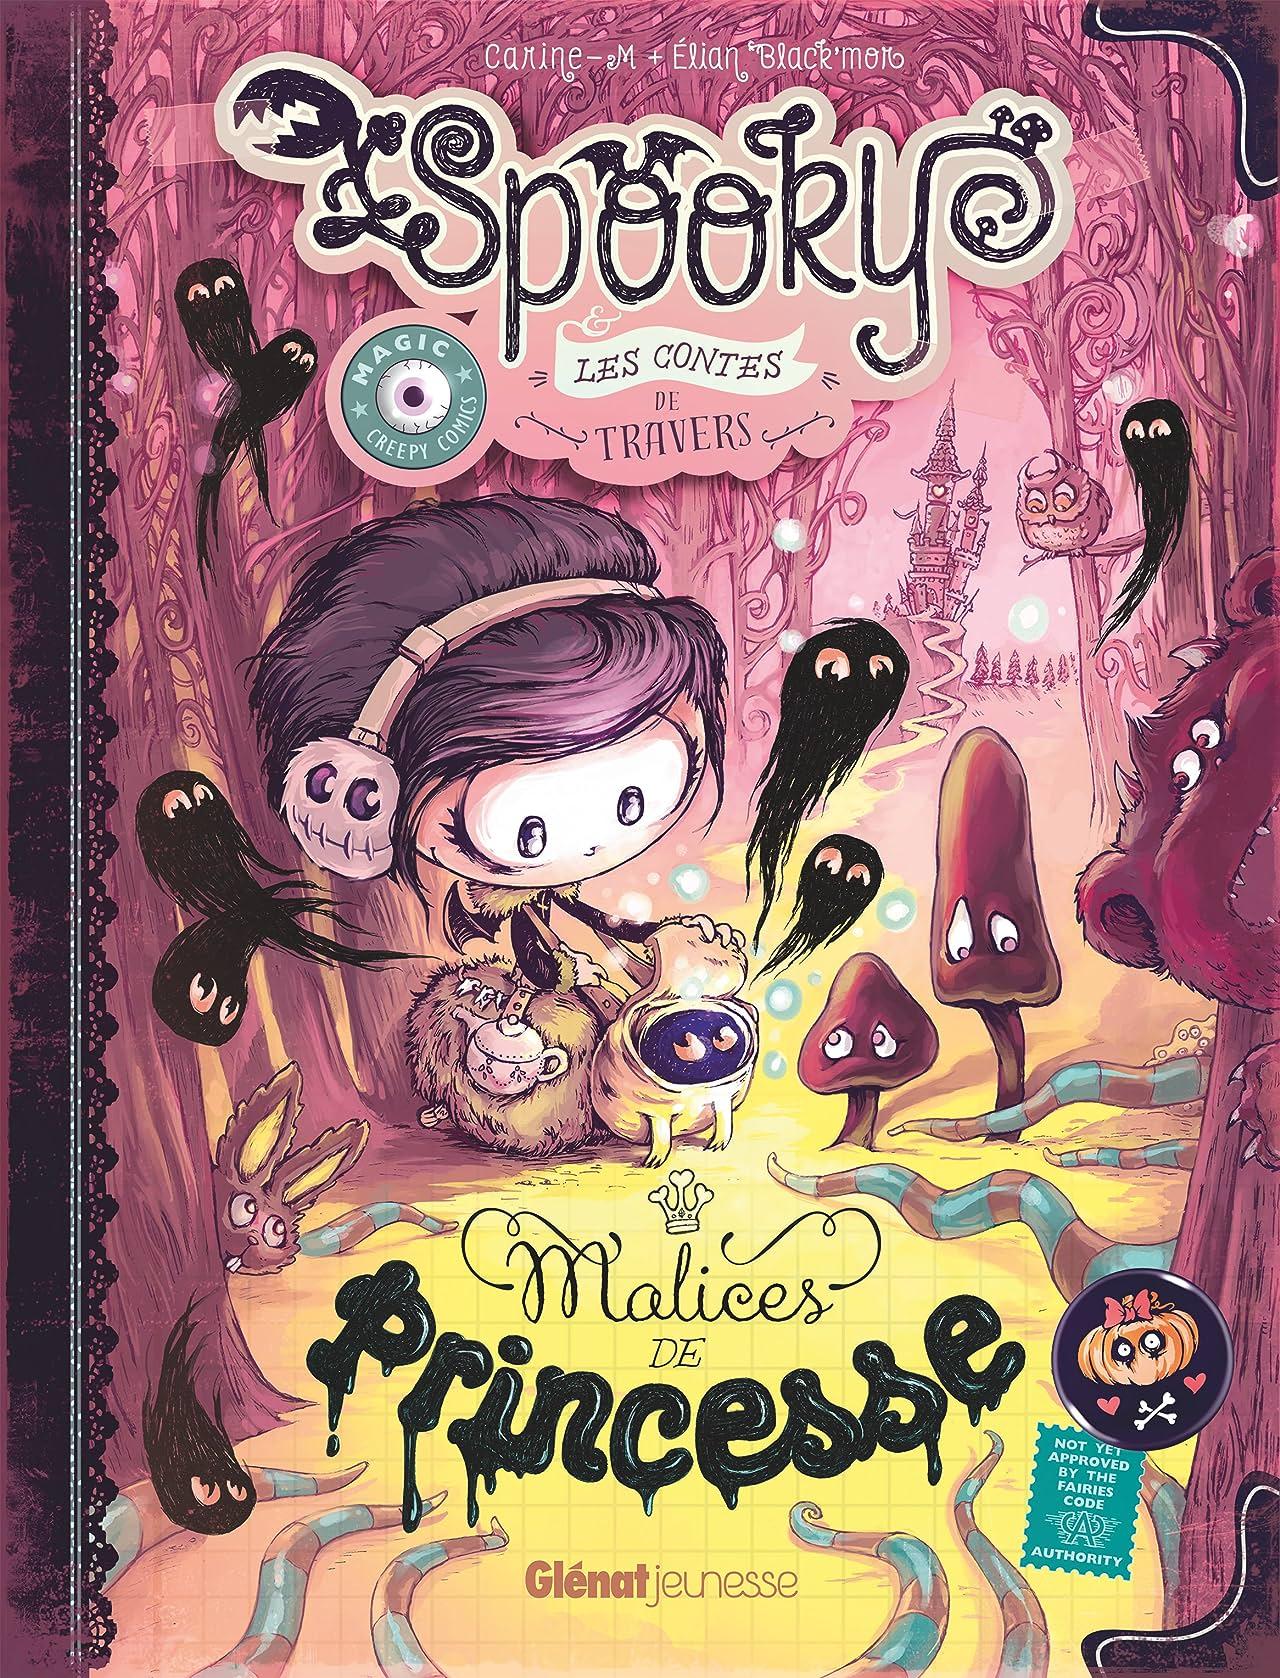 Spooky & les contes de travers Vol. 3: Malices de princesse